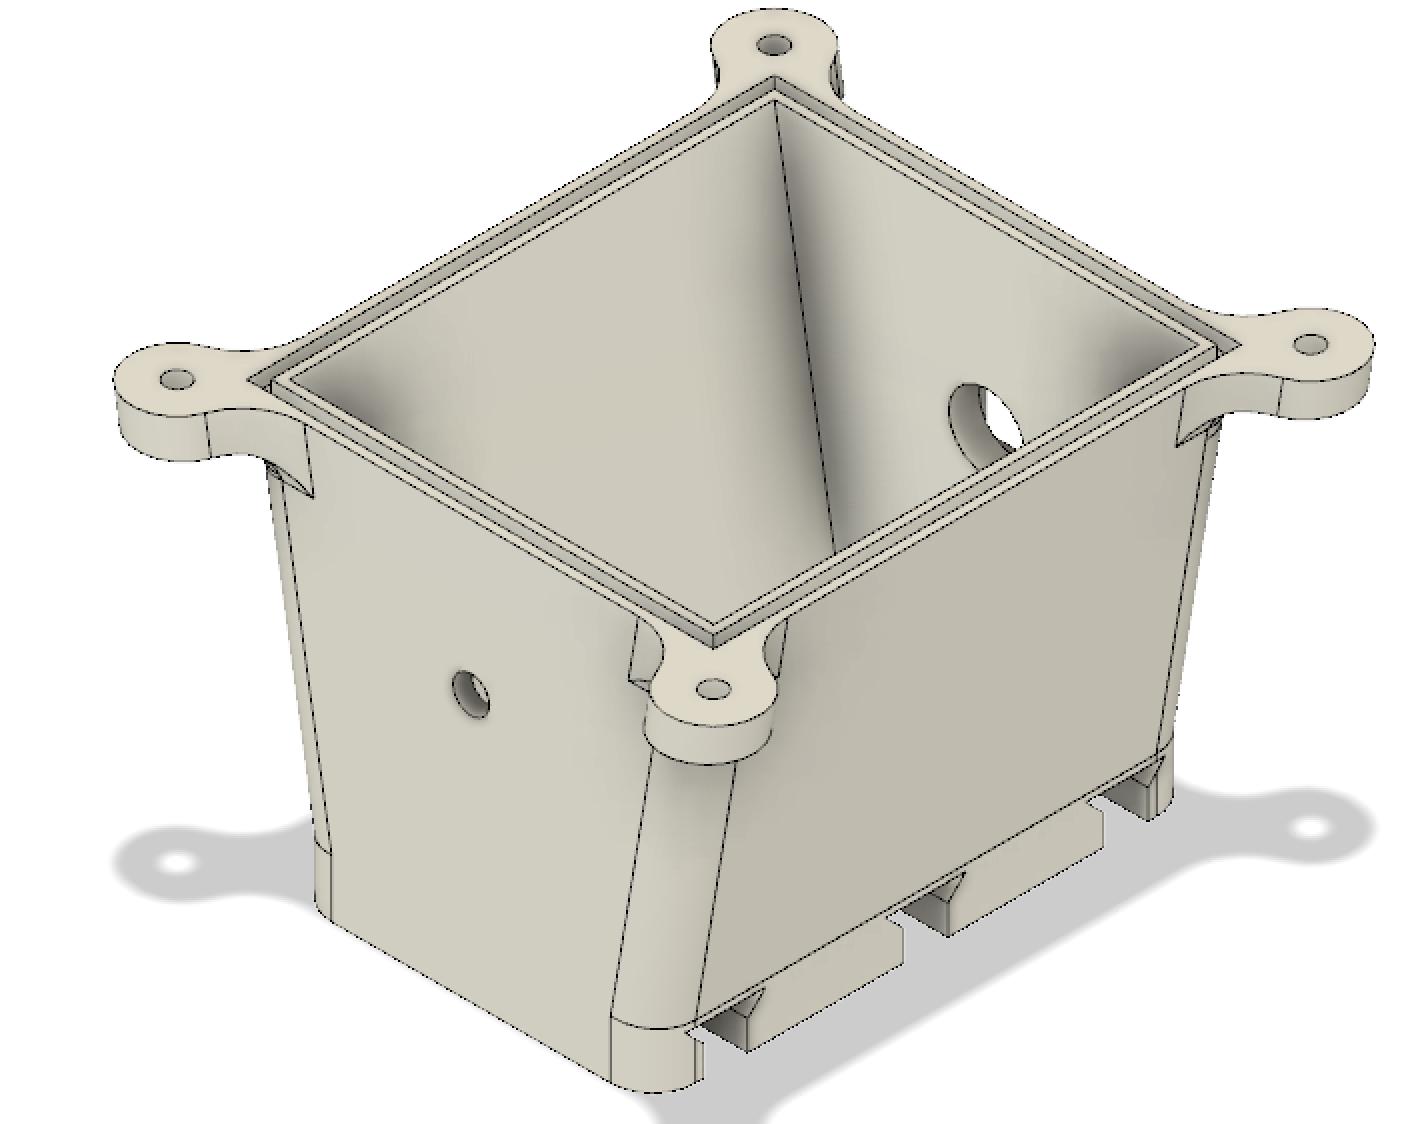 Electronics case CAD